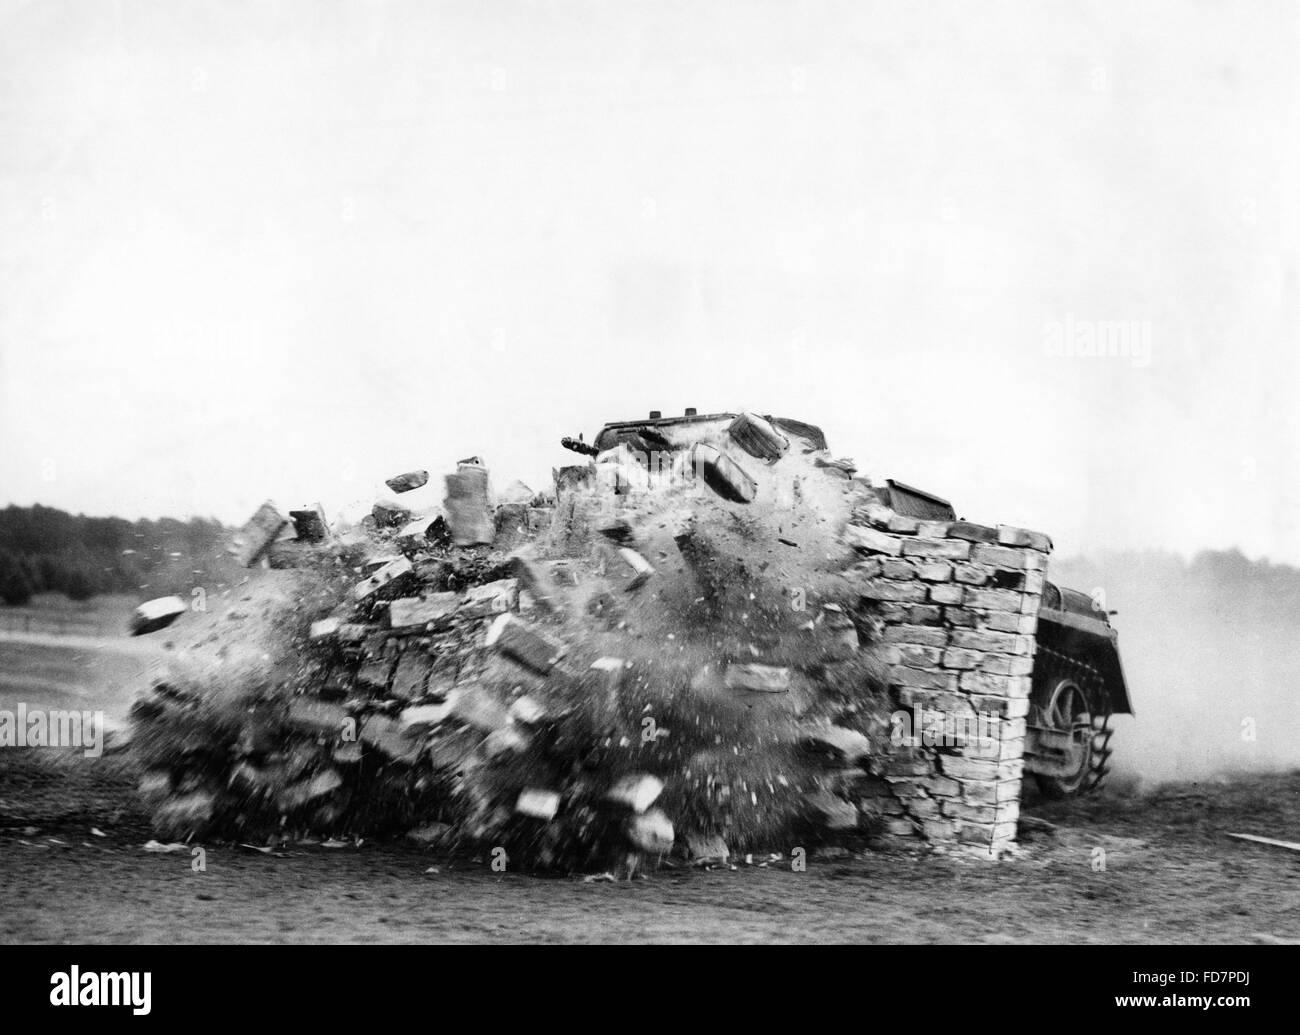 Panzer I breaks through a wall, 1936 - Stock Image